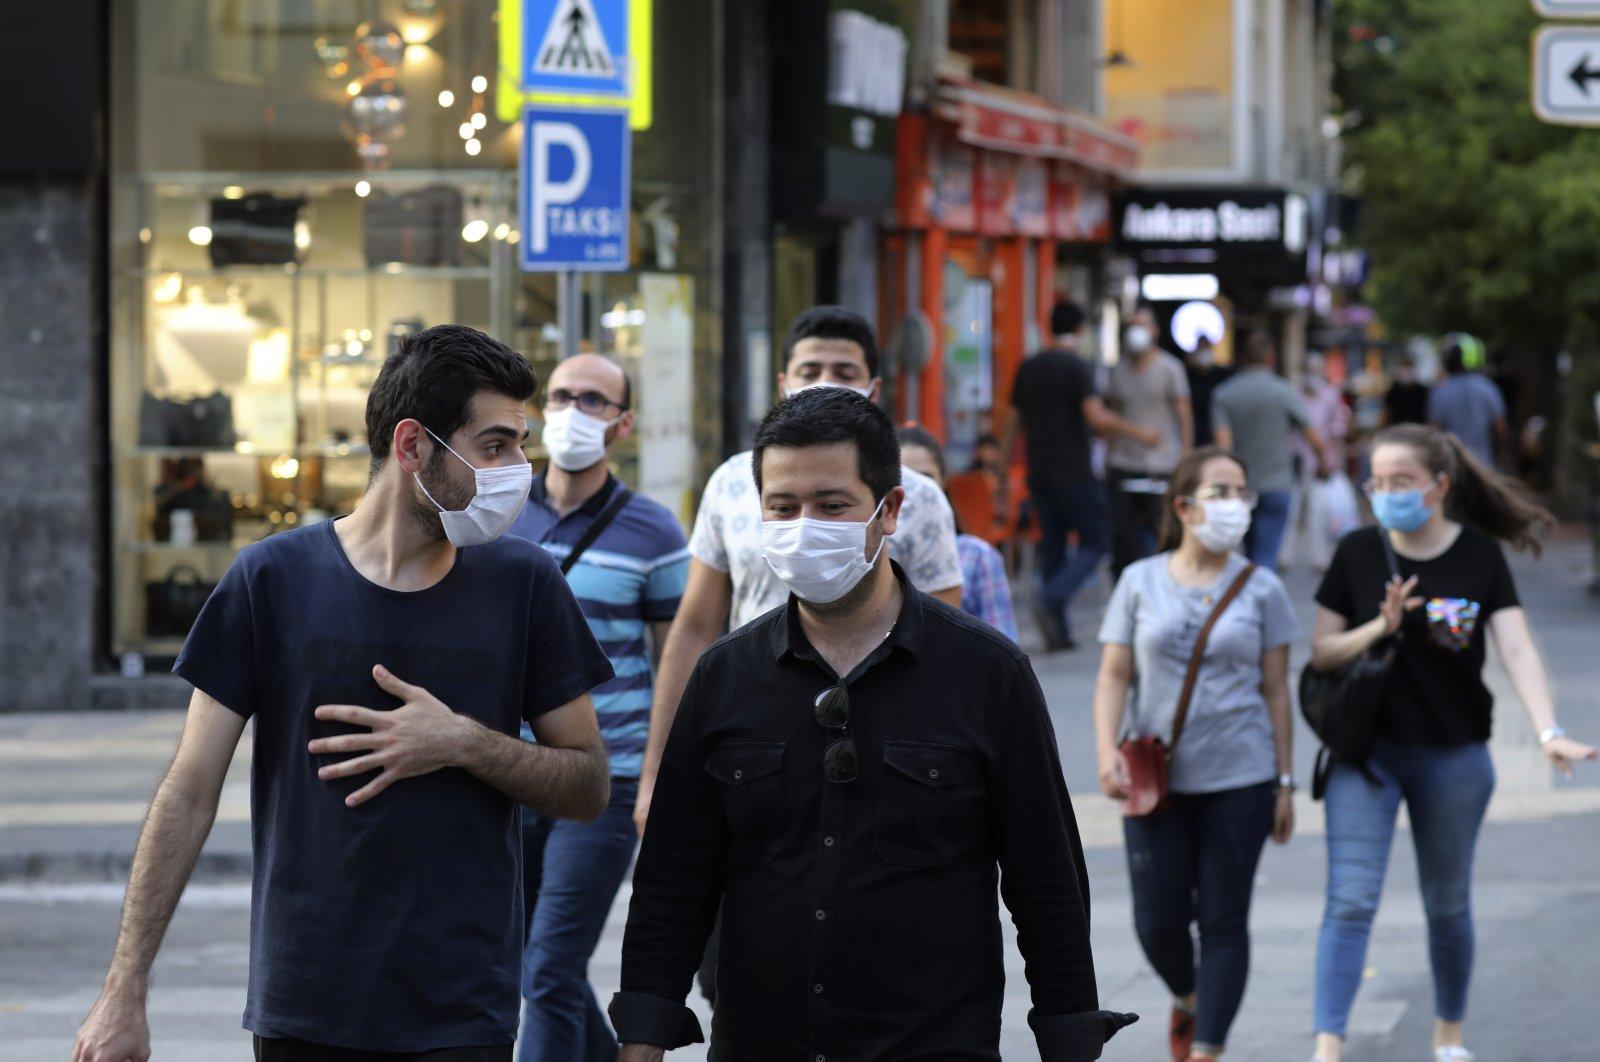 People wearing face masks walk on a street in the capital Ankara, Turkey, Aug. 6, 2020. (AP Photo)